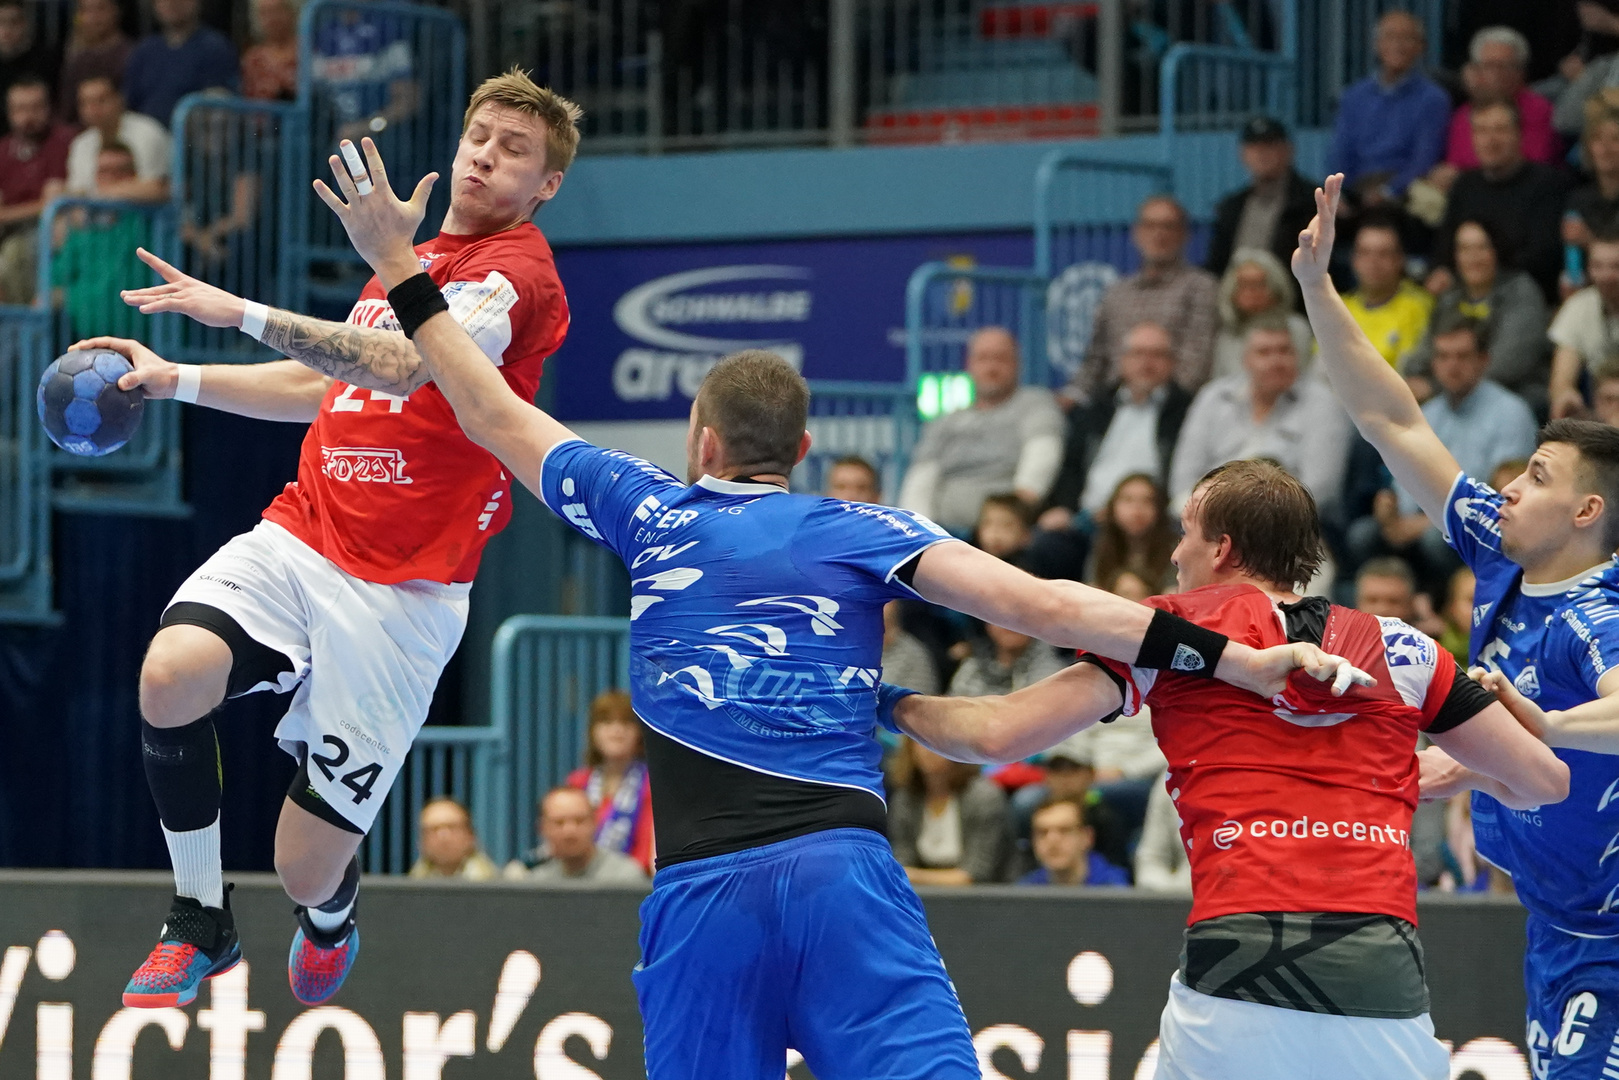 Handball Akademie Gummersbach